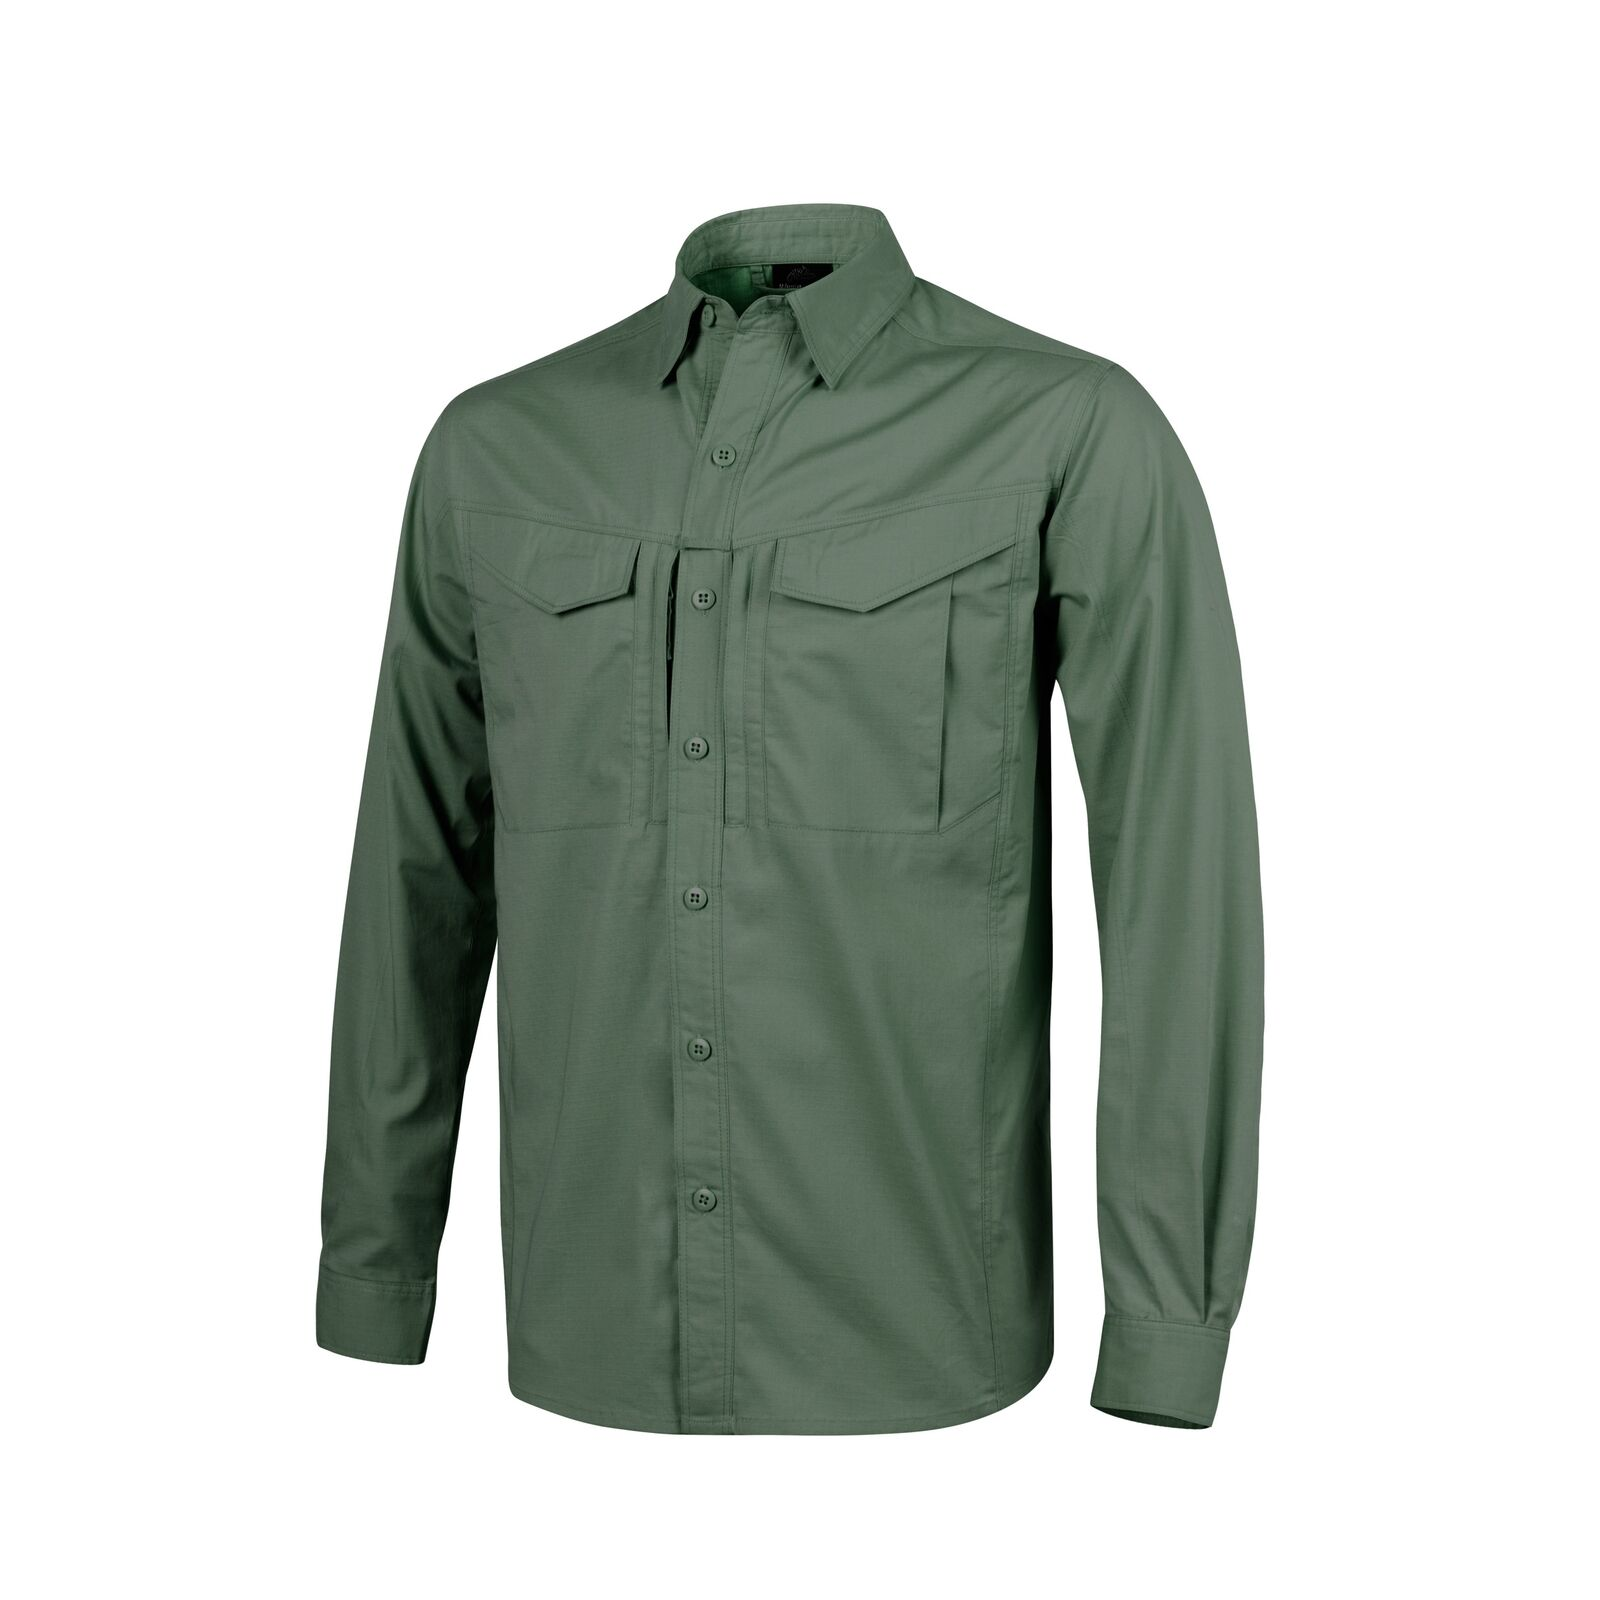 Helikon-Tex Defender Mk2 Long Sleeve Shirt HEMD TAKTISCH -Polycotton- Olive Gree